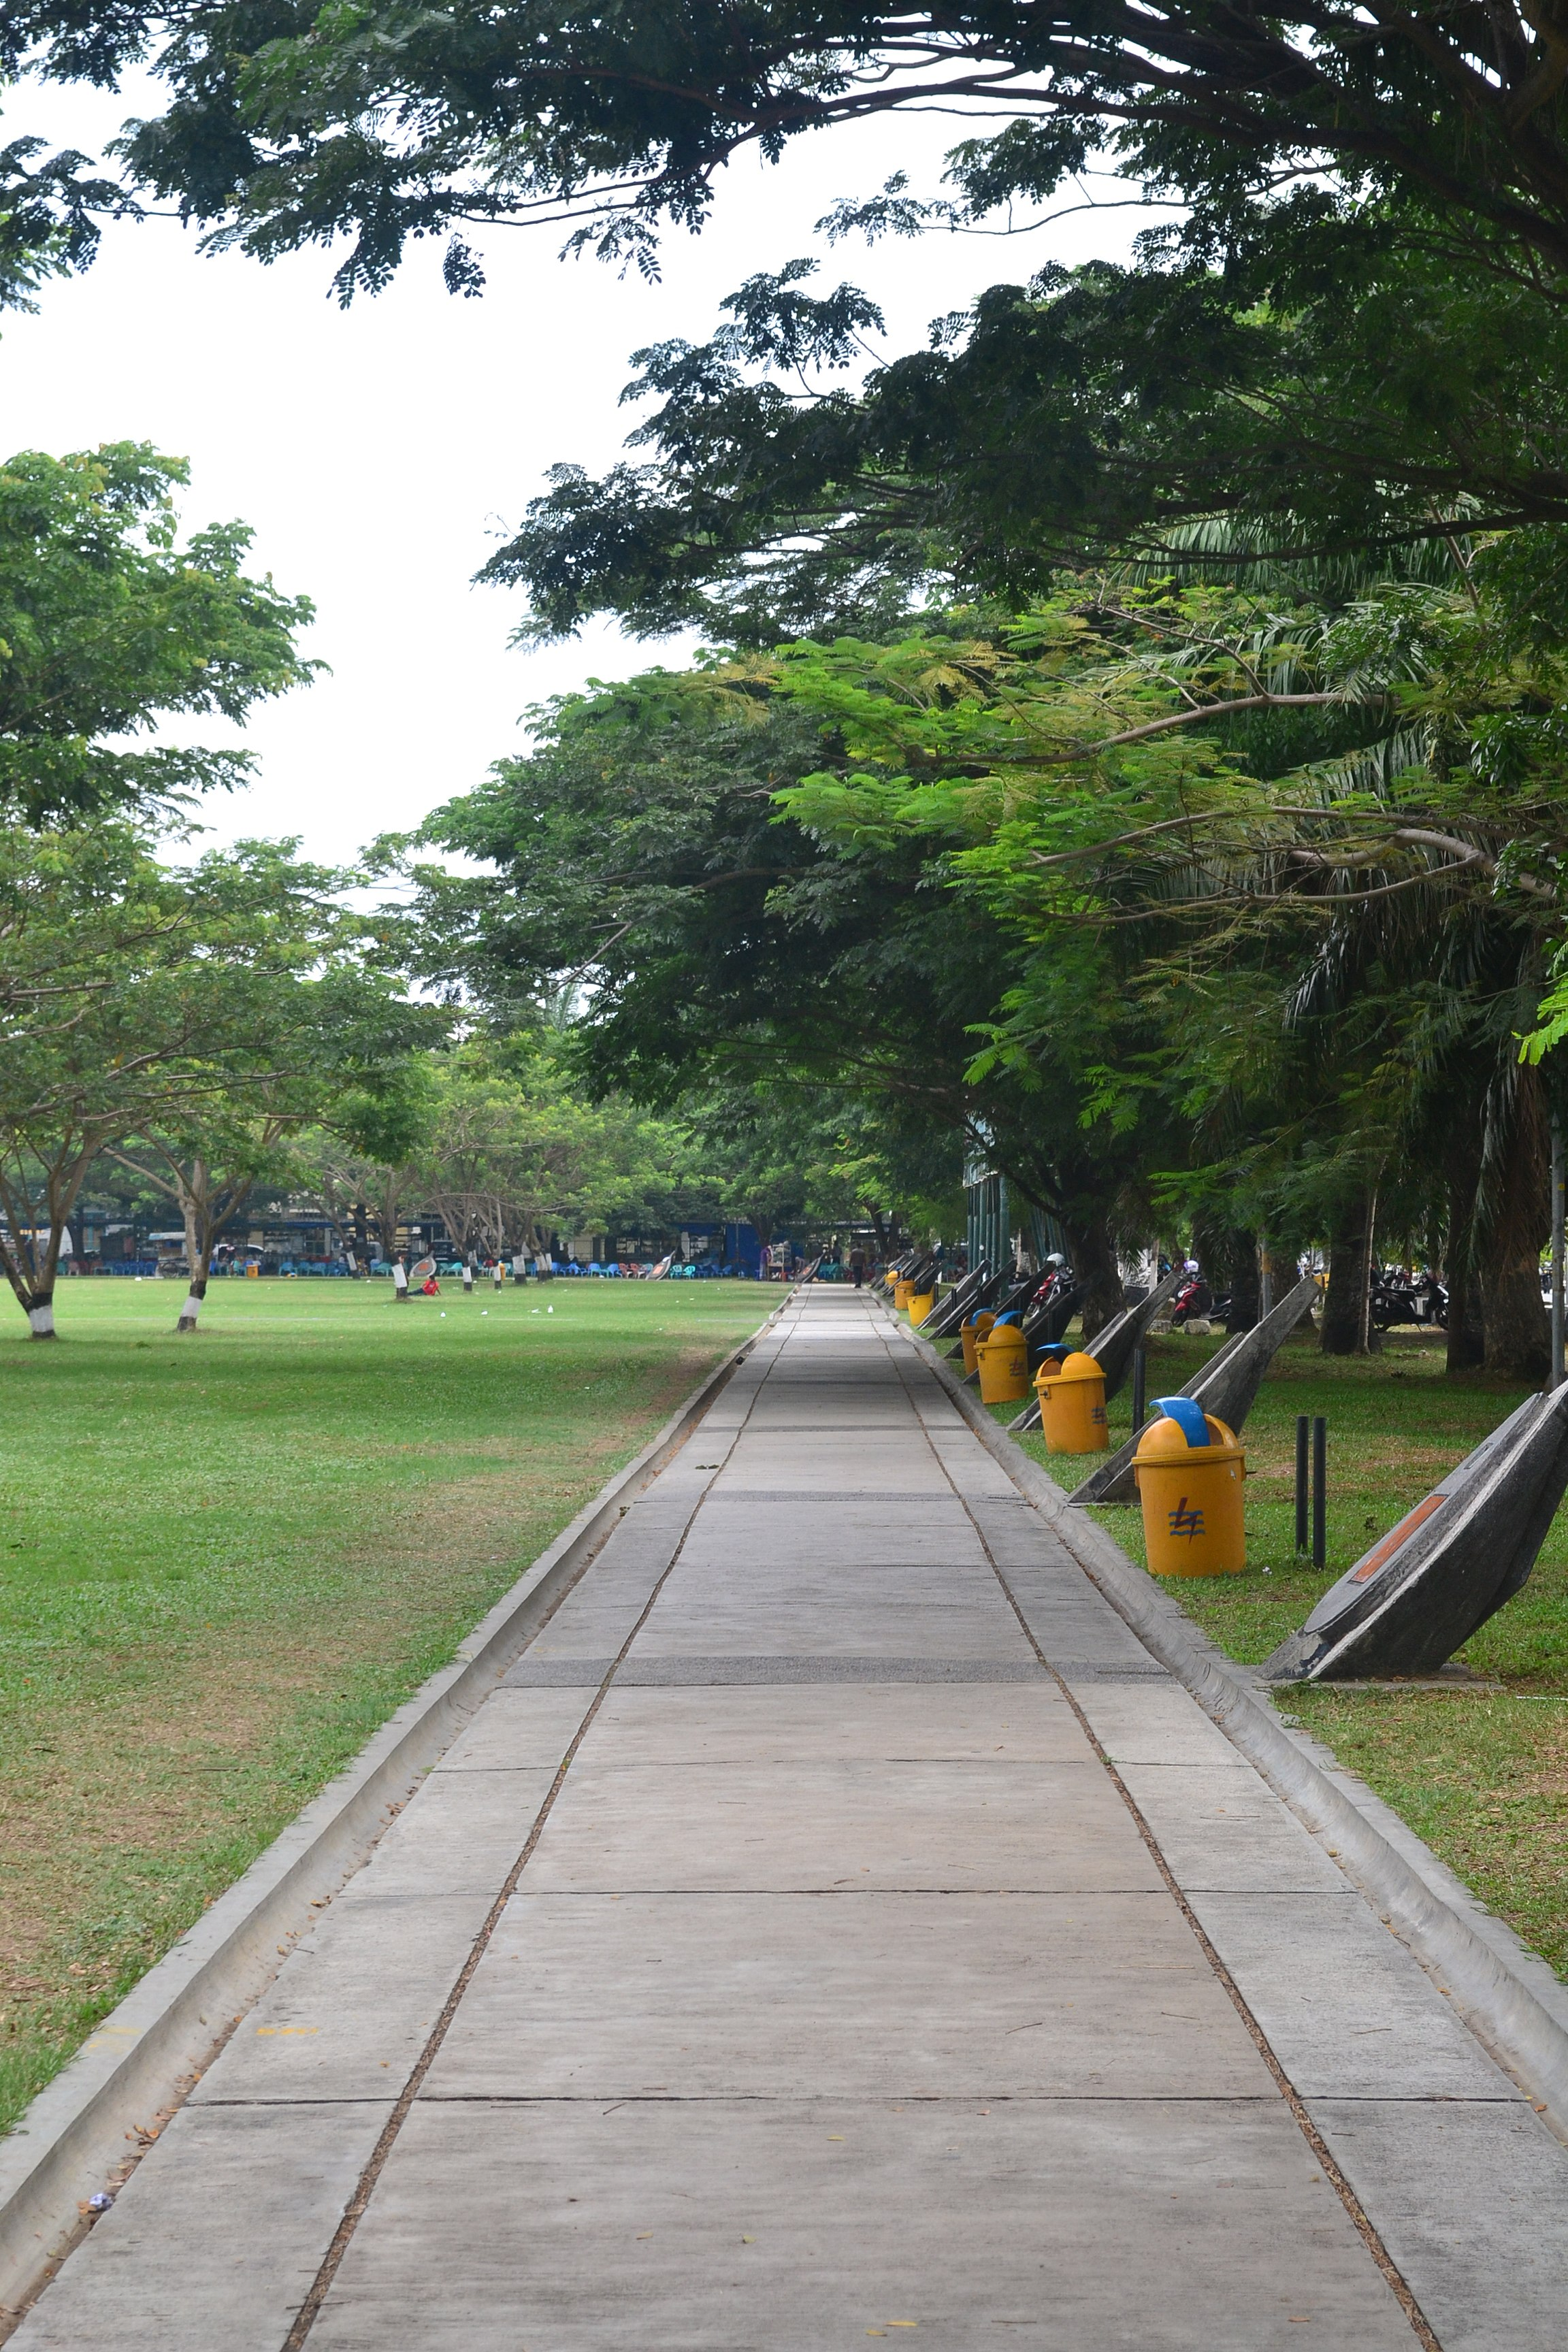 File Lintasan Lari Laun Di Lapangan Blang Padang Banda Aceh 2014 Jpg Wikimedia Commons